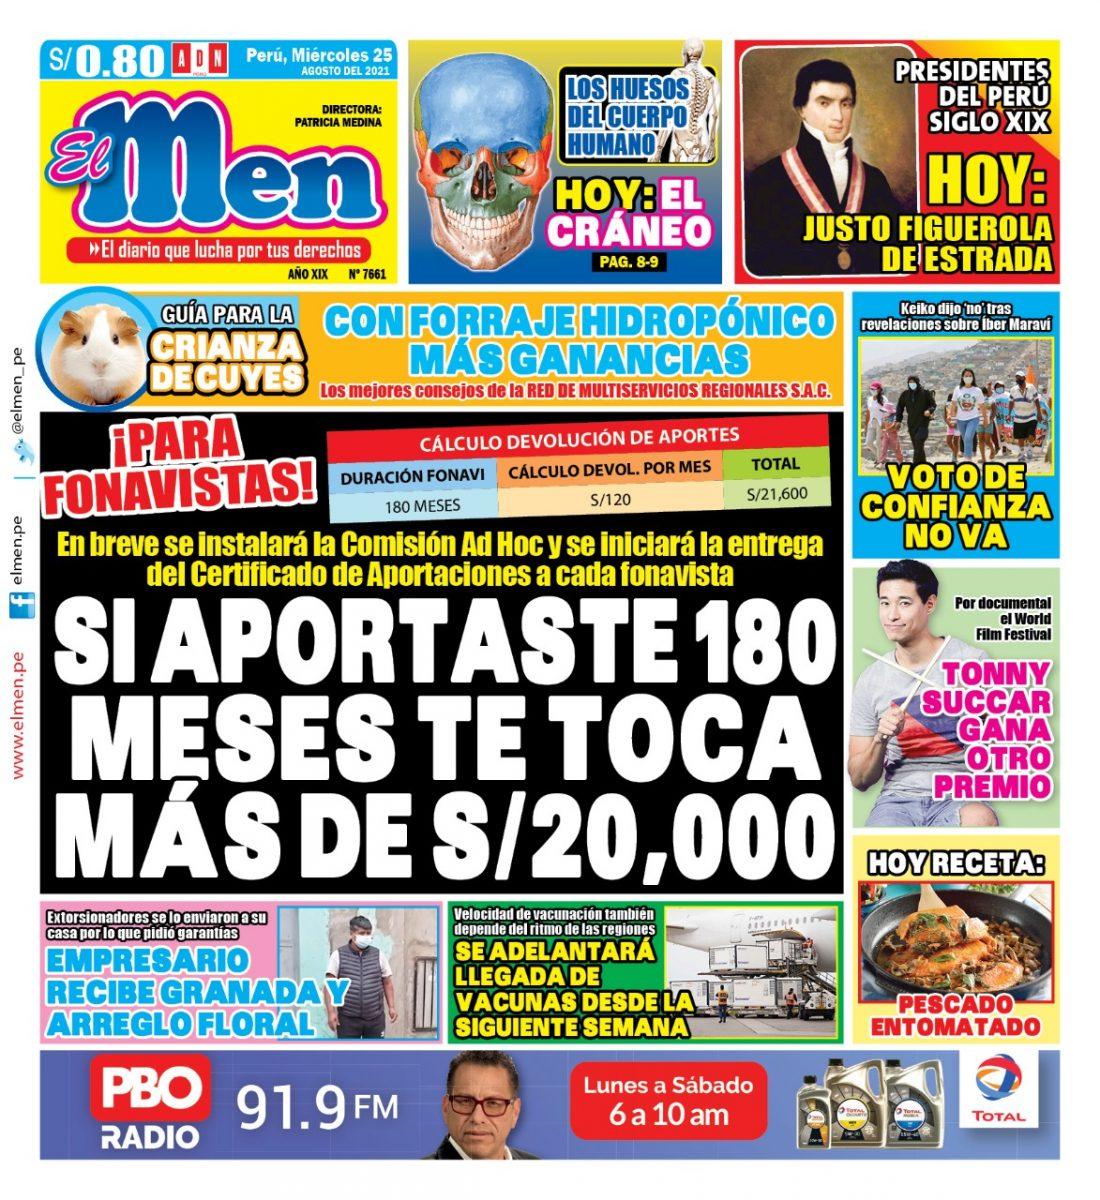 Portada impresa – Diario El Men (25/08/2021)